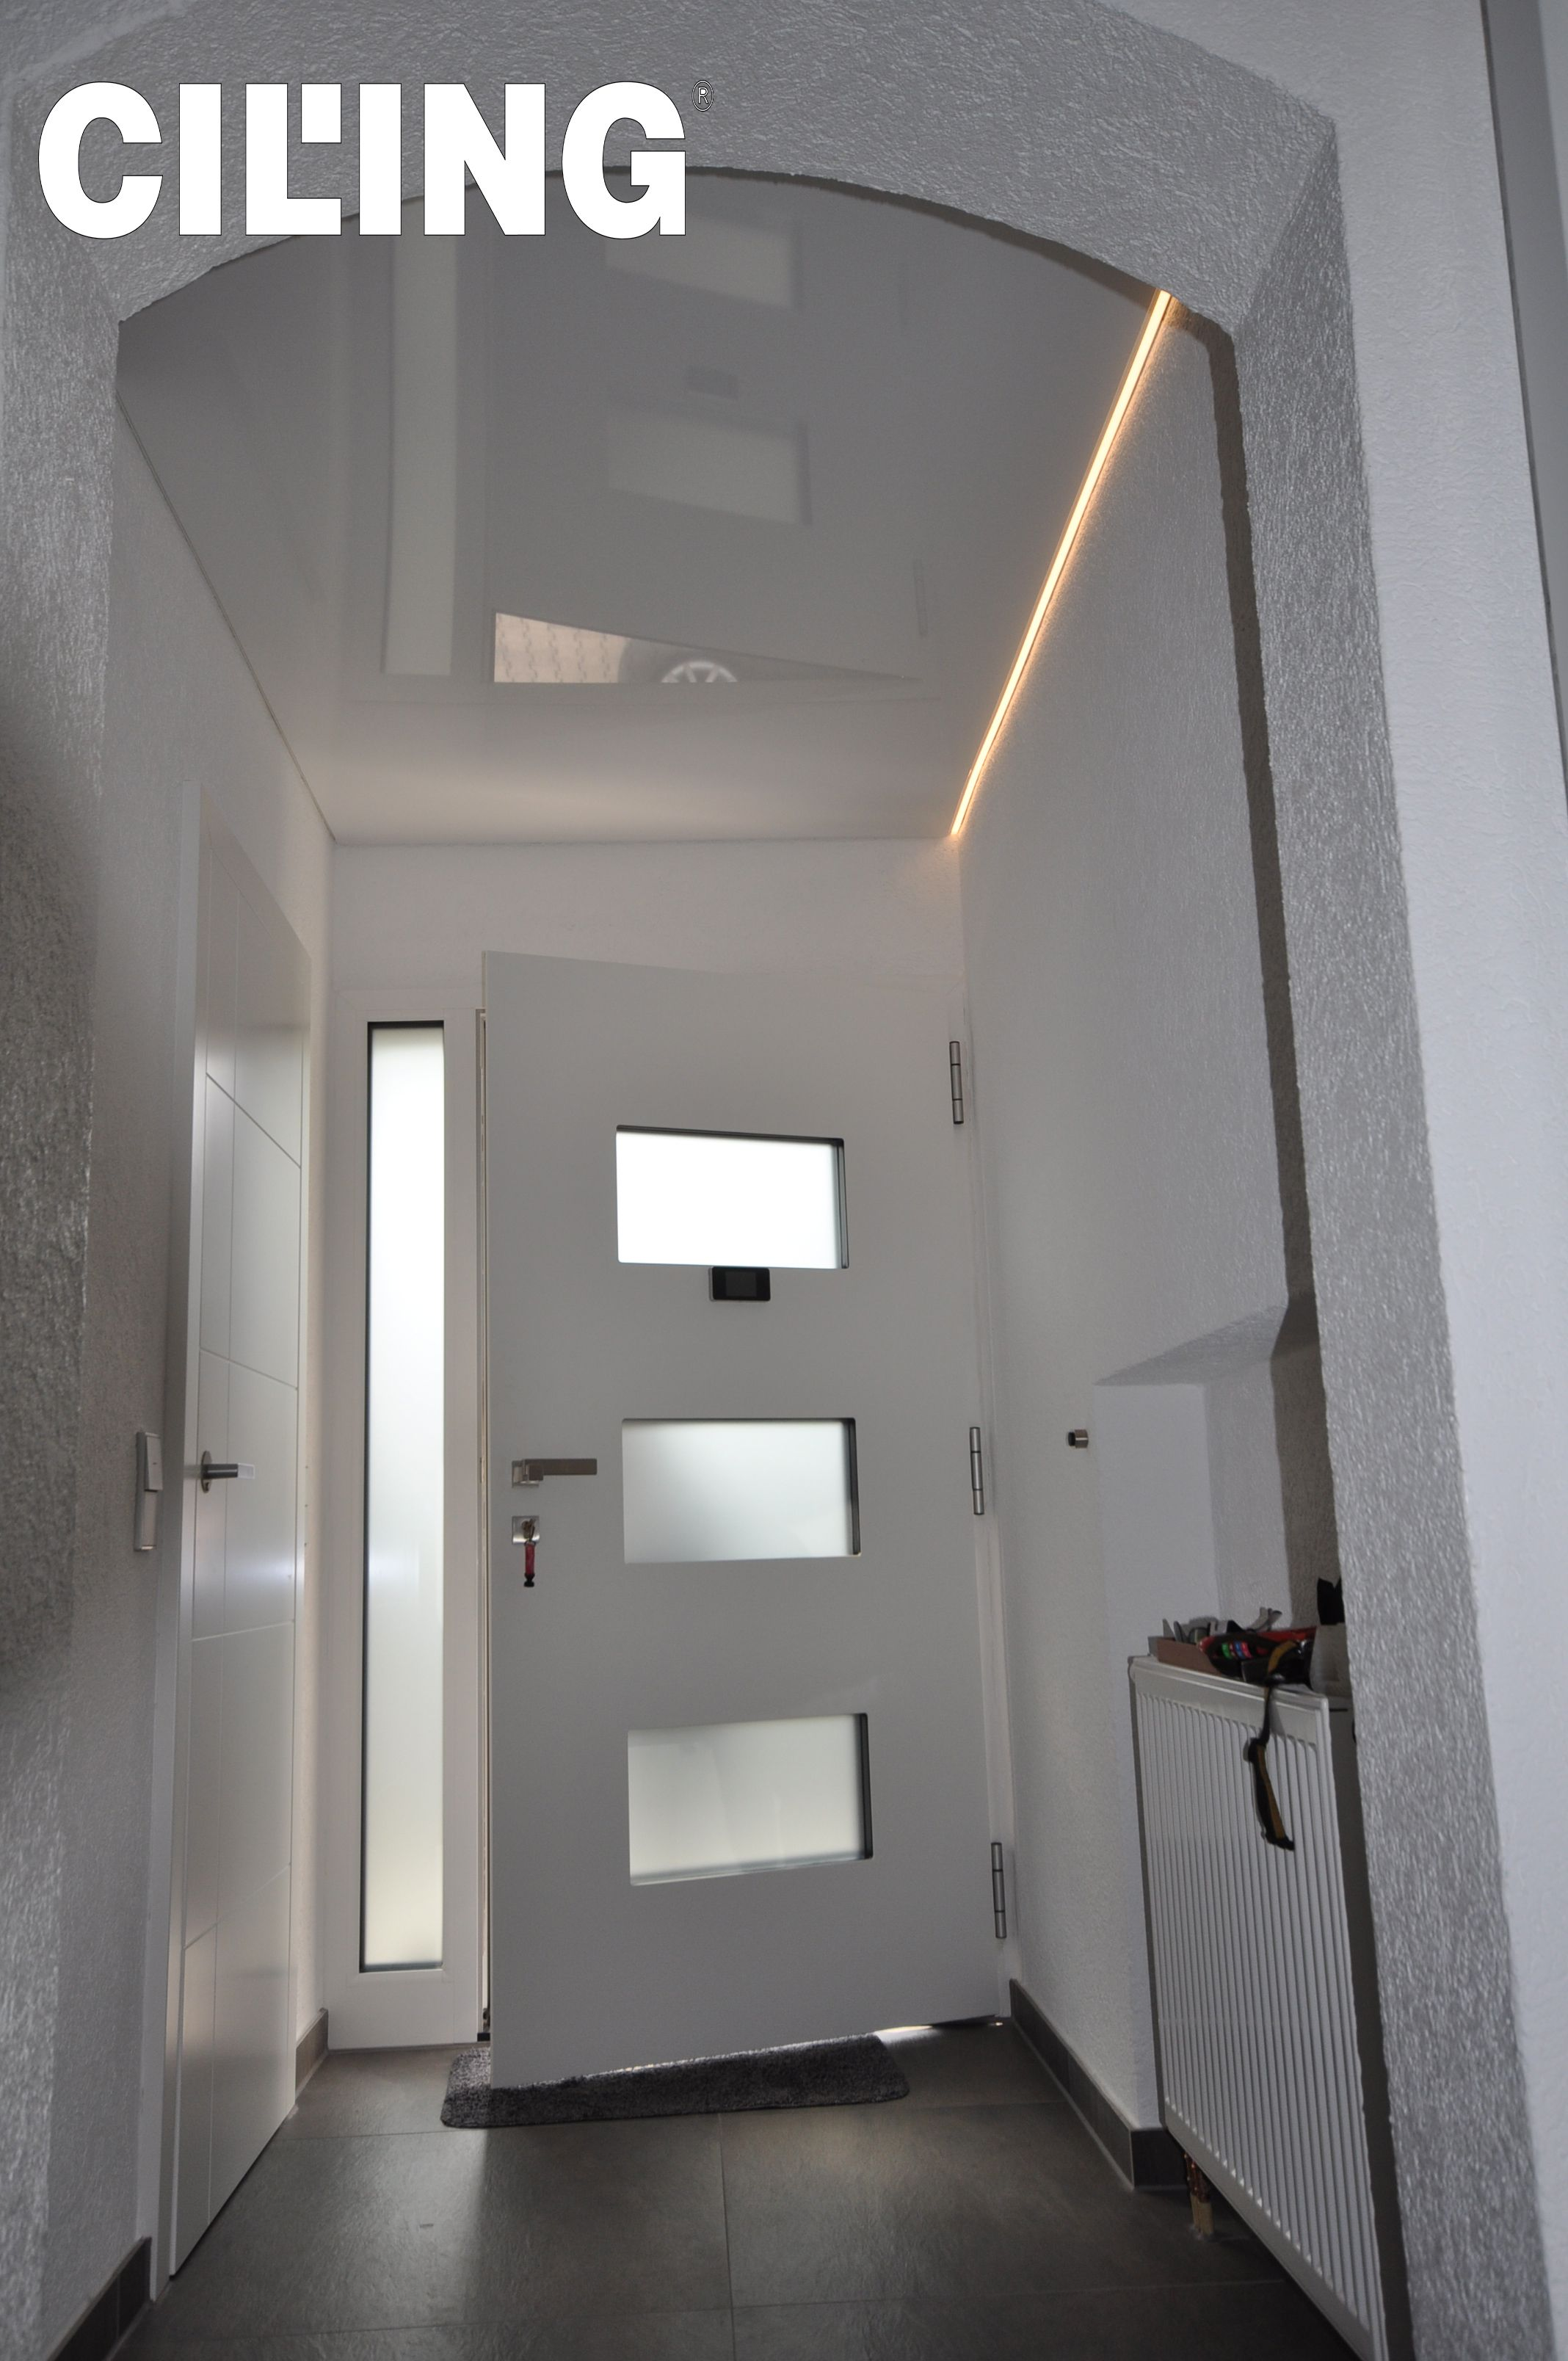 Beleuchtung Eingangsbereich Led Leiste Ciling Beleuchtung Badezimmerspiegel Led Licht